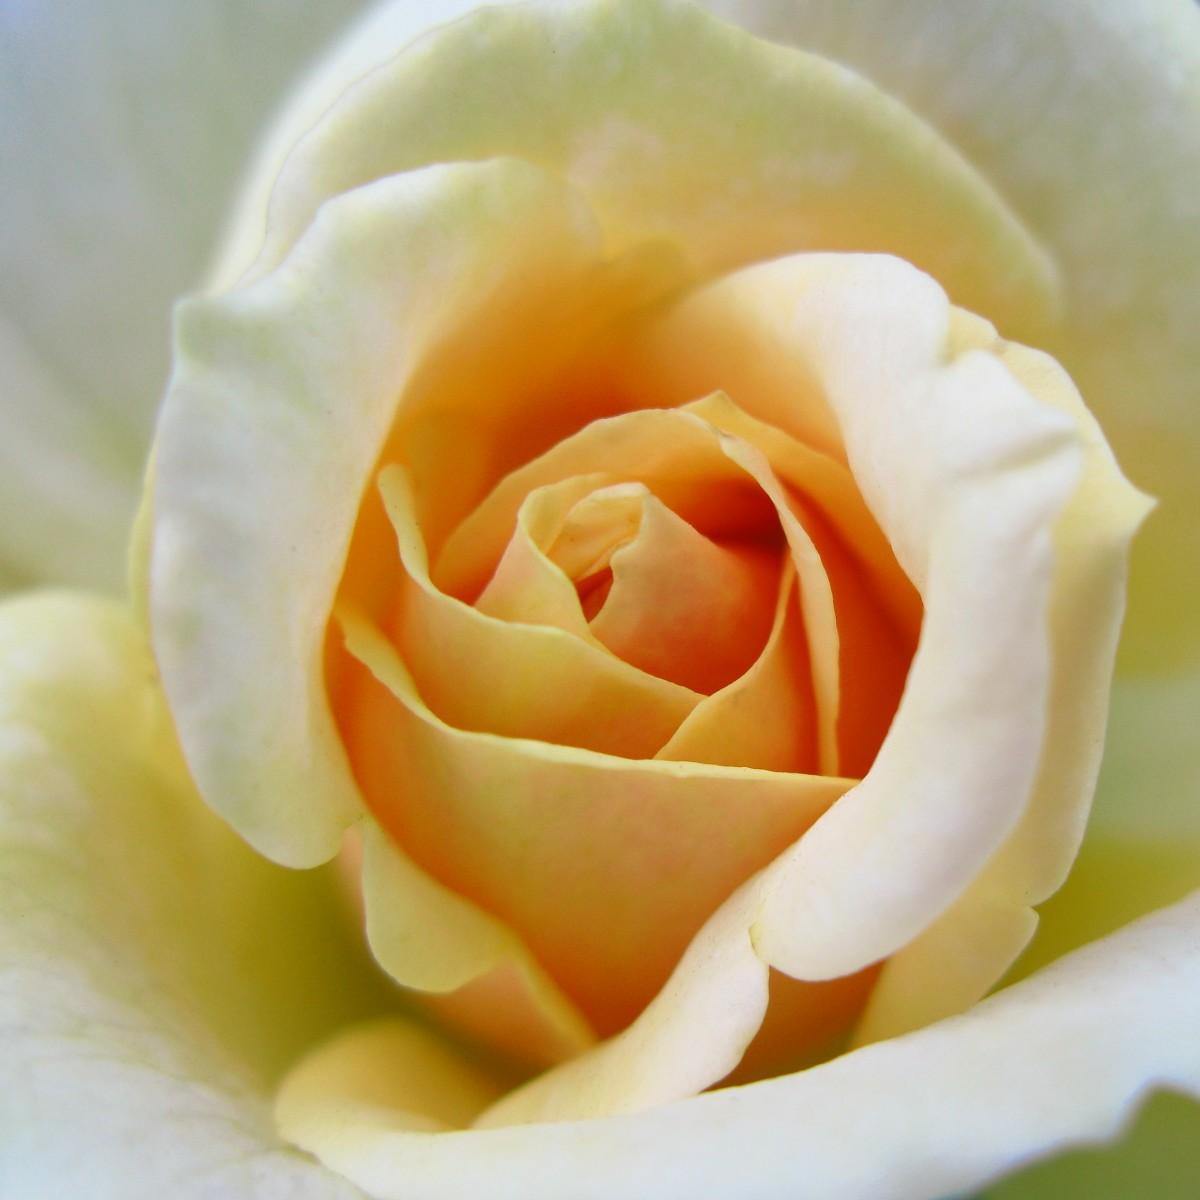 Garden Roses Flower Petal: Free Images : Flower, Petal, High, Red, Pink, Cool Image